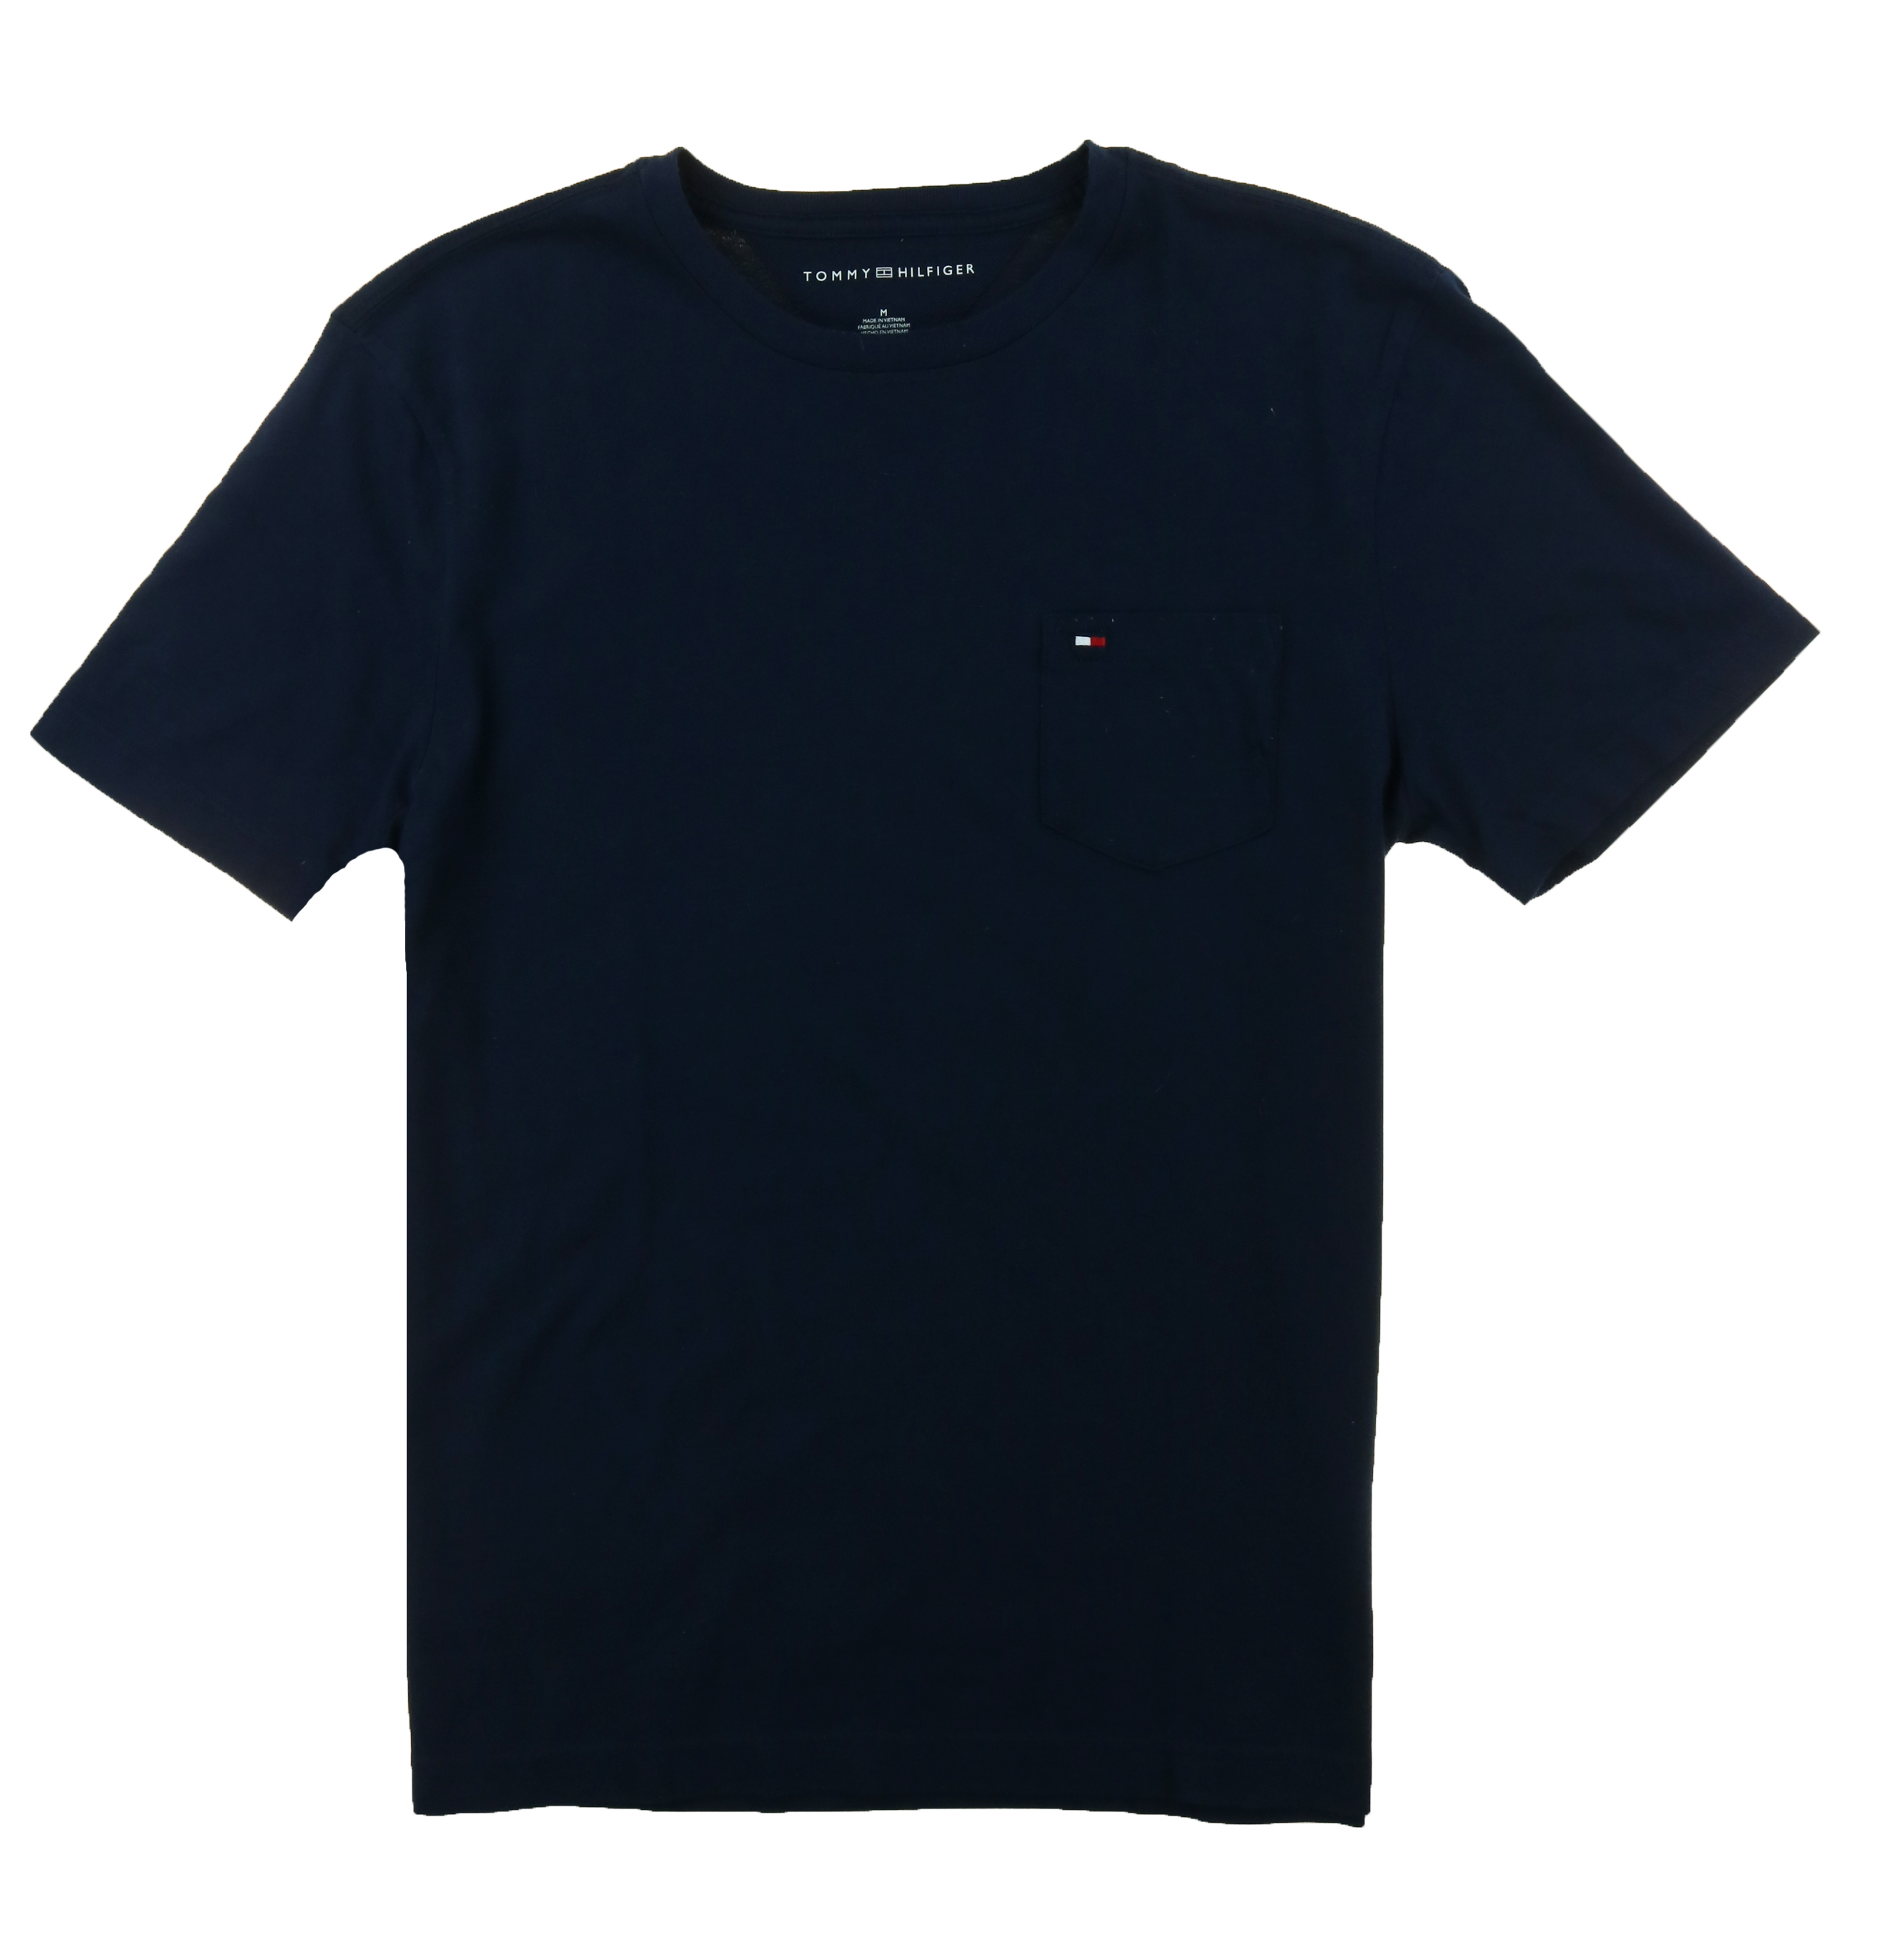 Tommy-Hilfiger-Mens-Crew-Neck-Pocket-T-shirt thumbnail 8